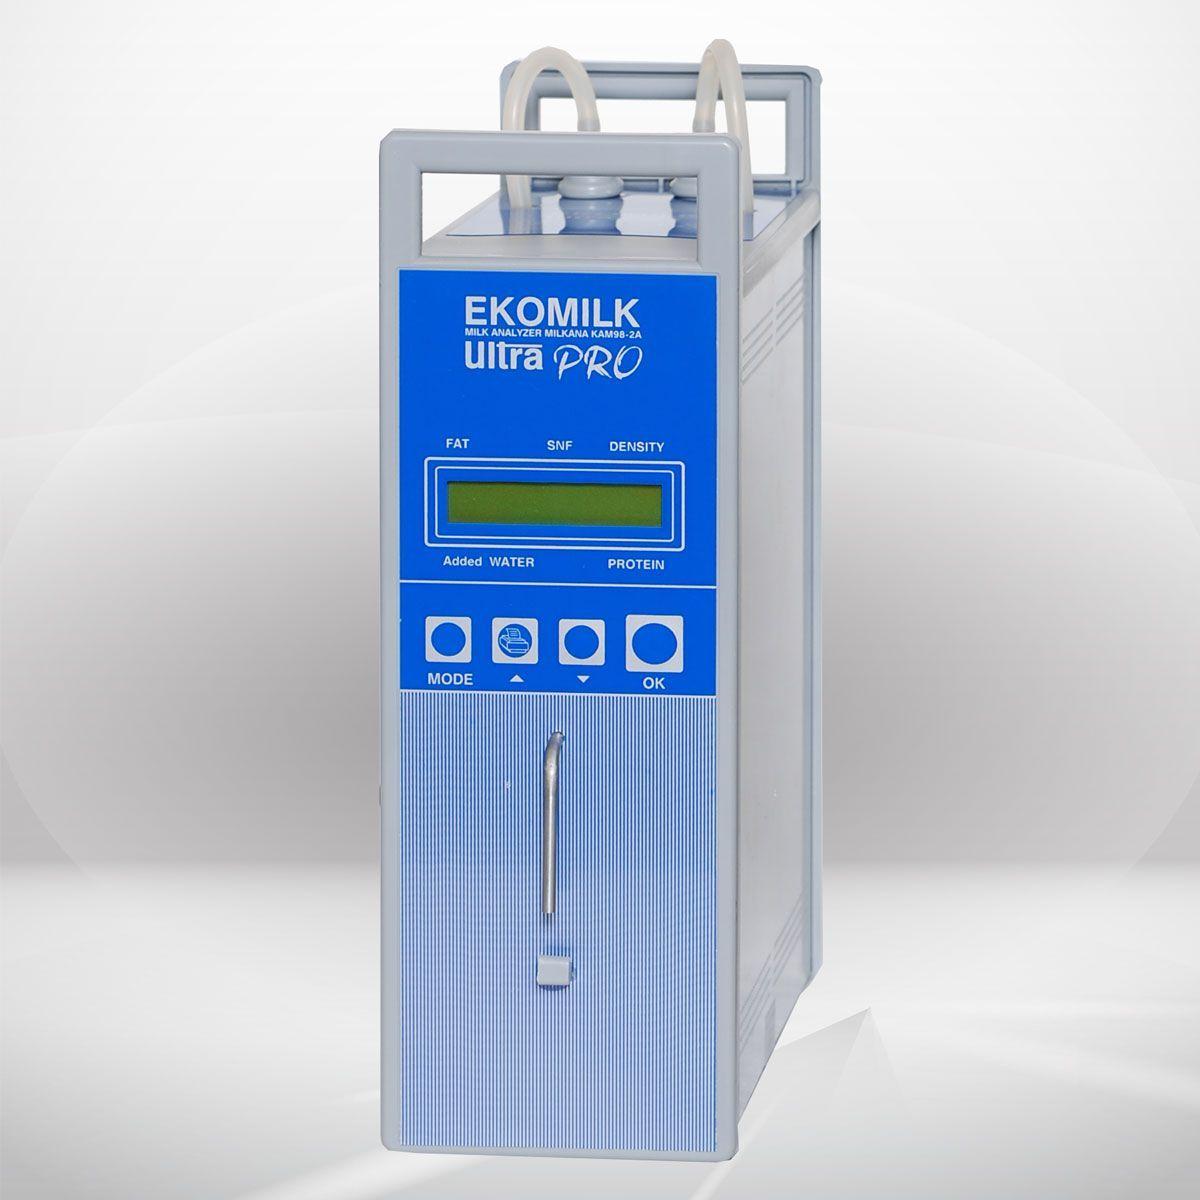 Máy phân tích sữa 30 giây, model: Ekomilk ULTRA PRO